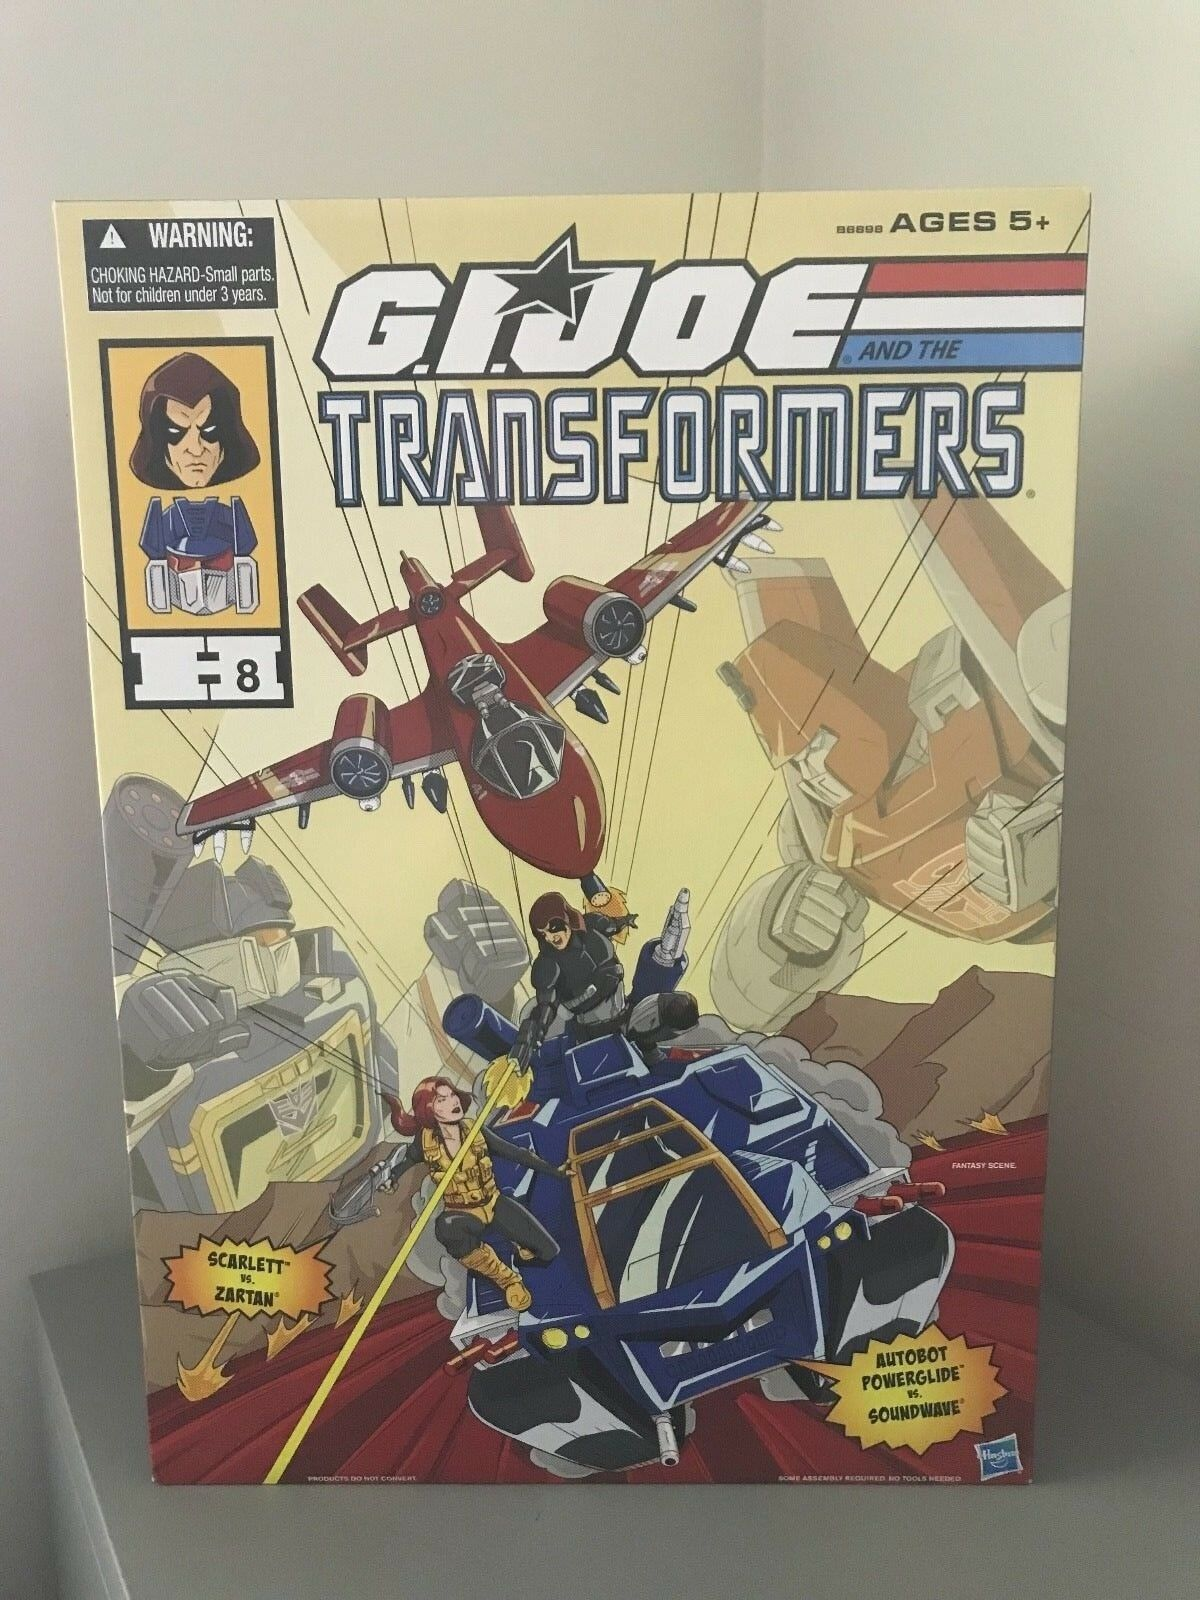 GI Joe & Transformers SDCC 2016 w Soundwave, Powerglide, Zartan - Rare